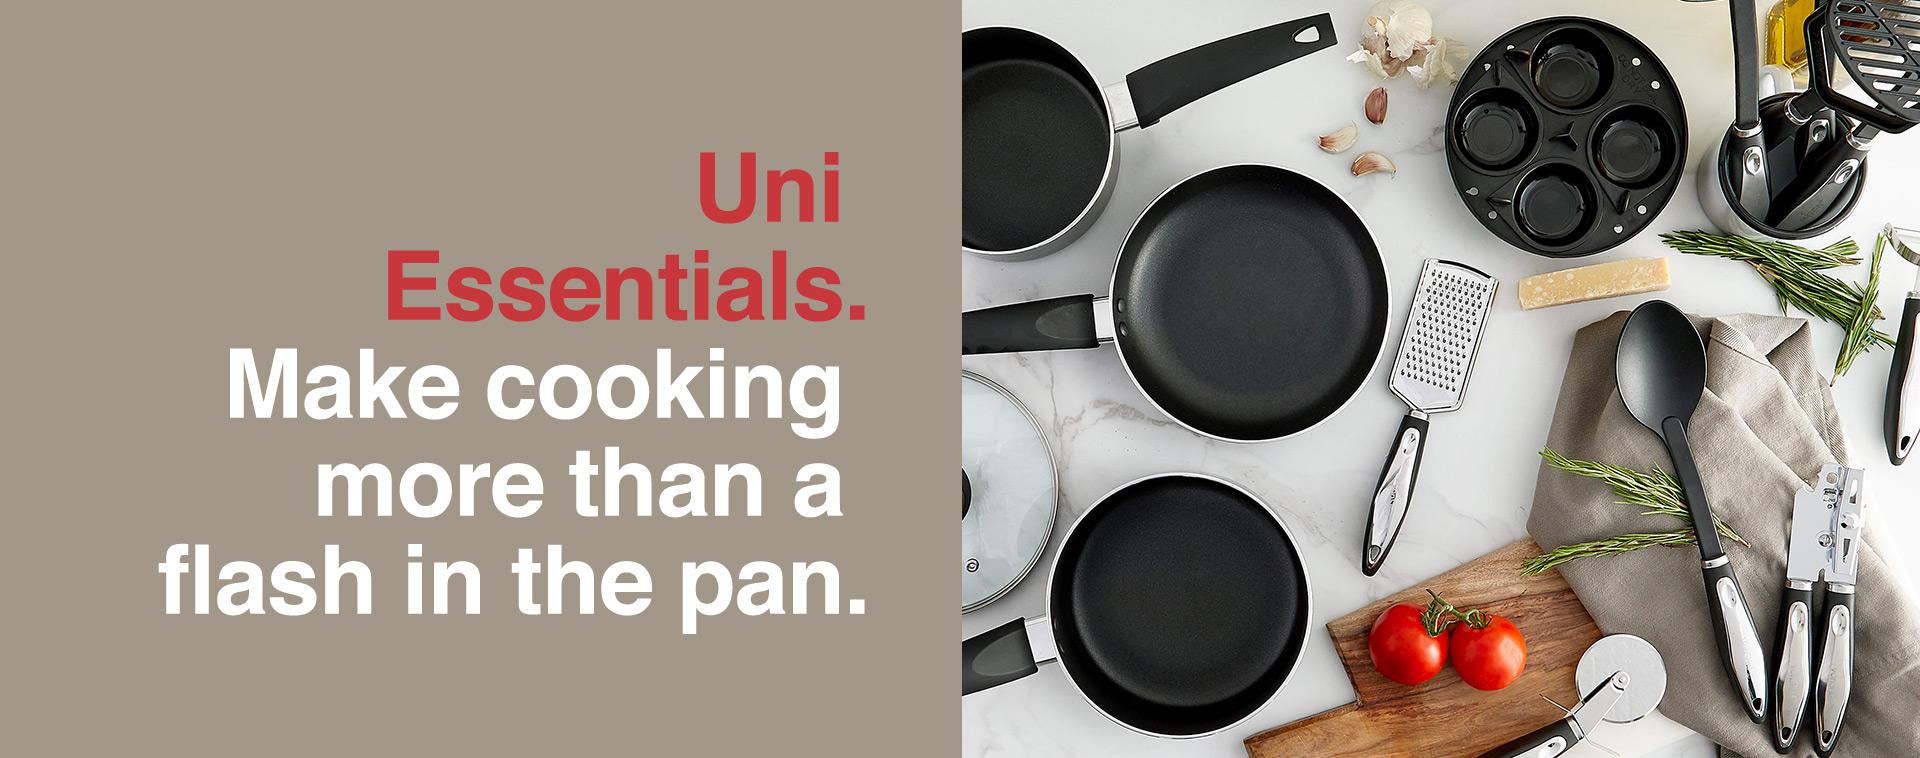 what to take to uni kitchen essentials